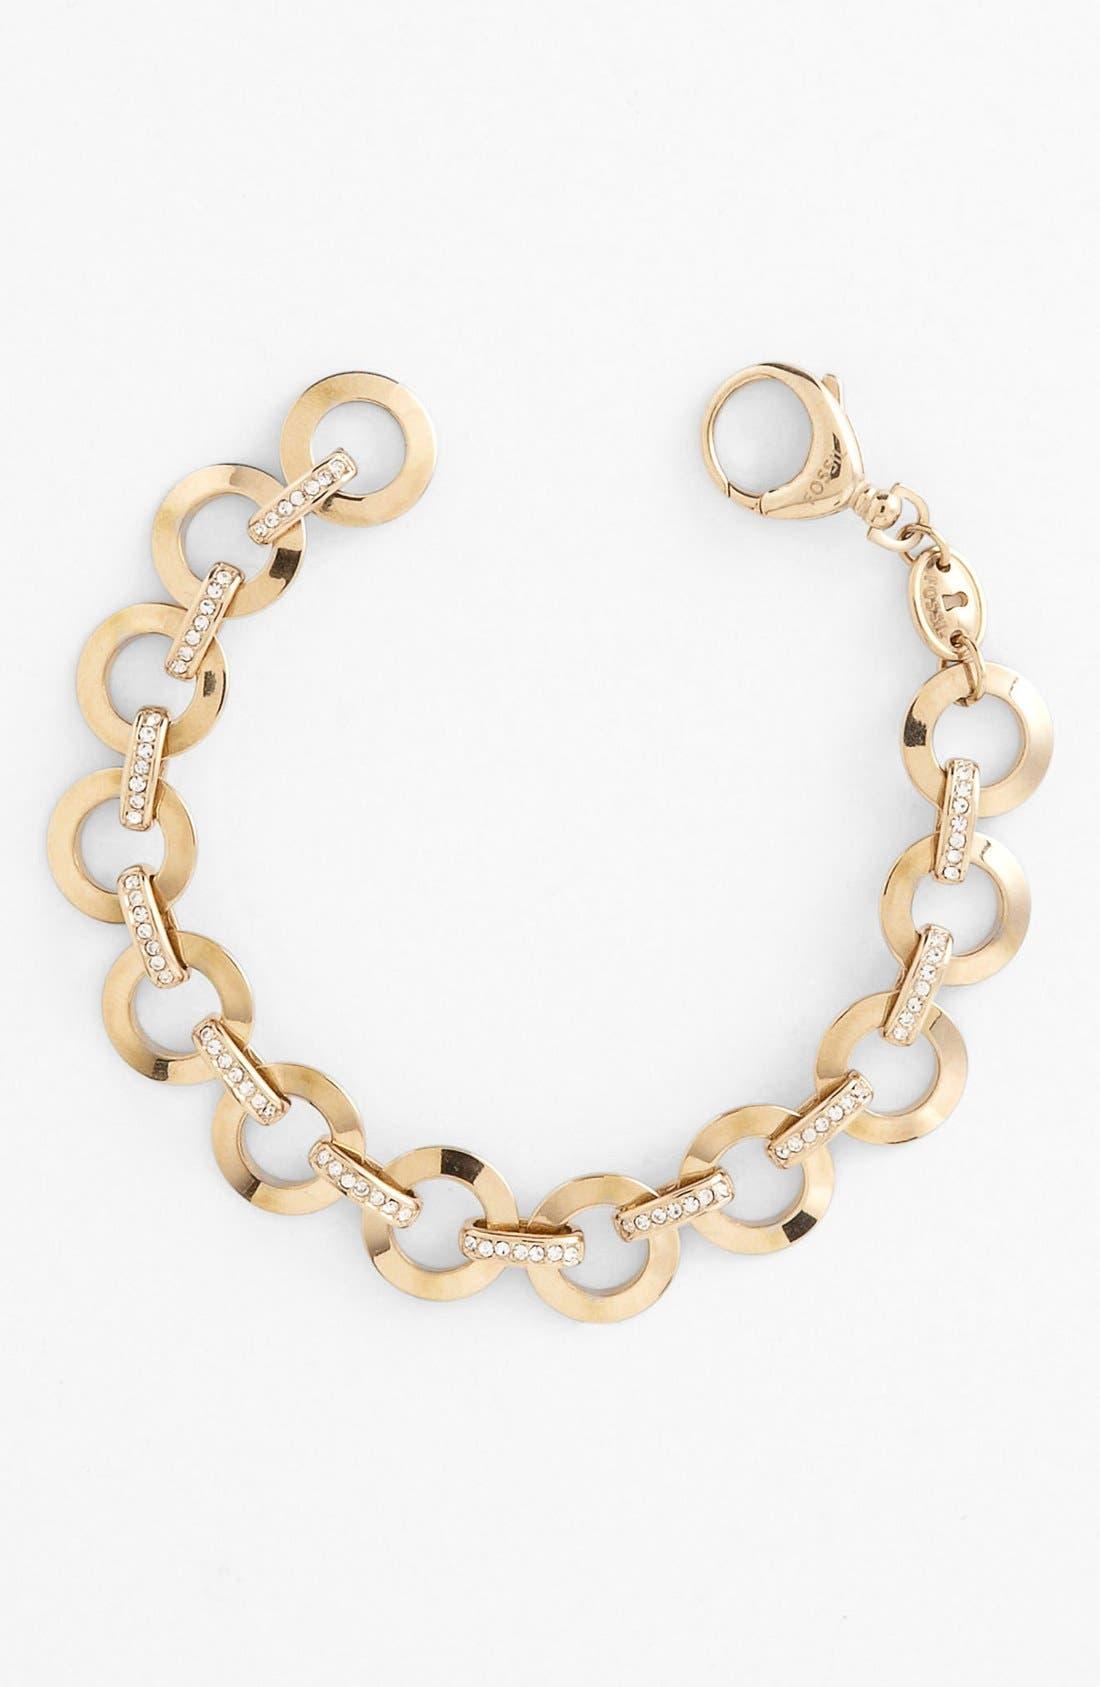 Alternate Image 1 Selected - Fossil Circle Link Charm Bracelet